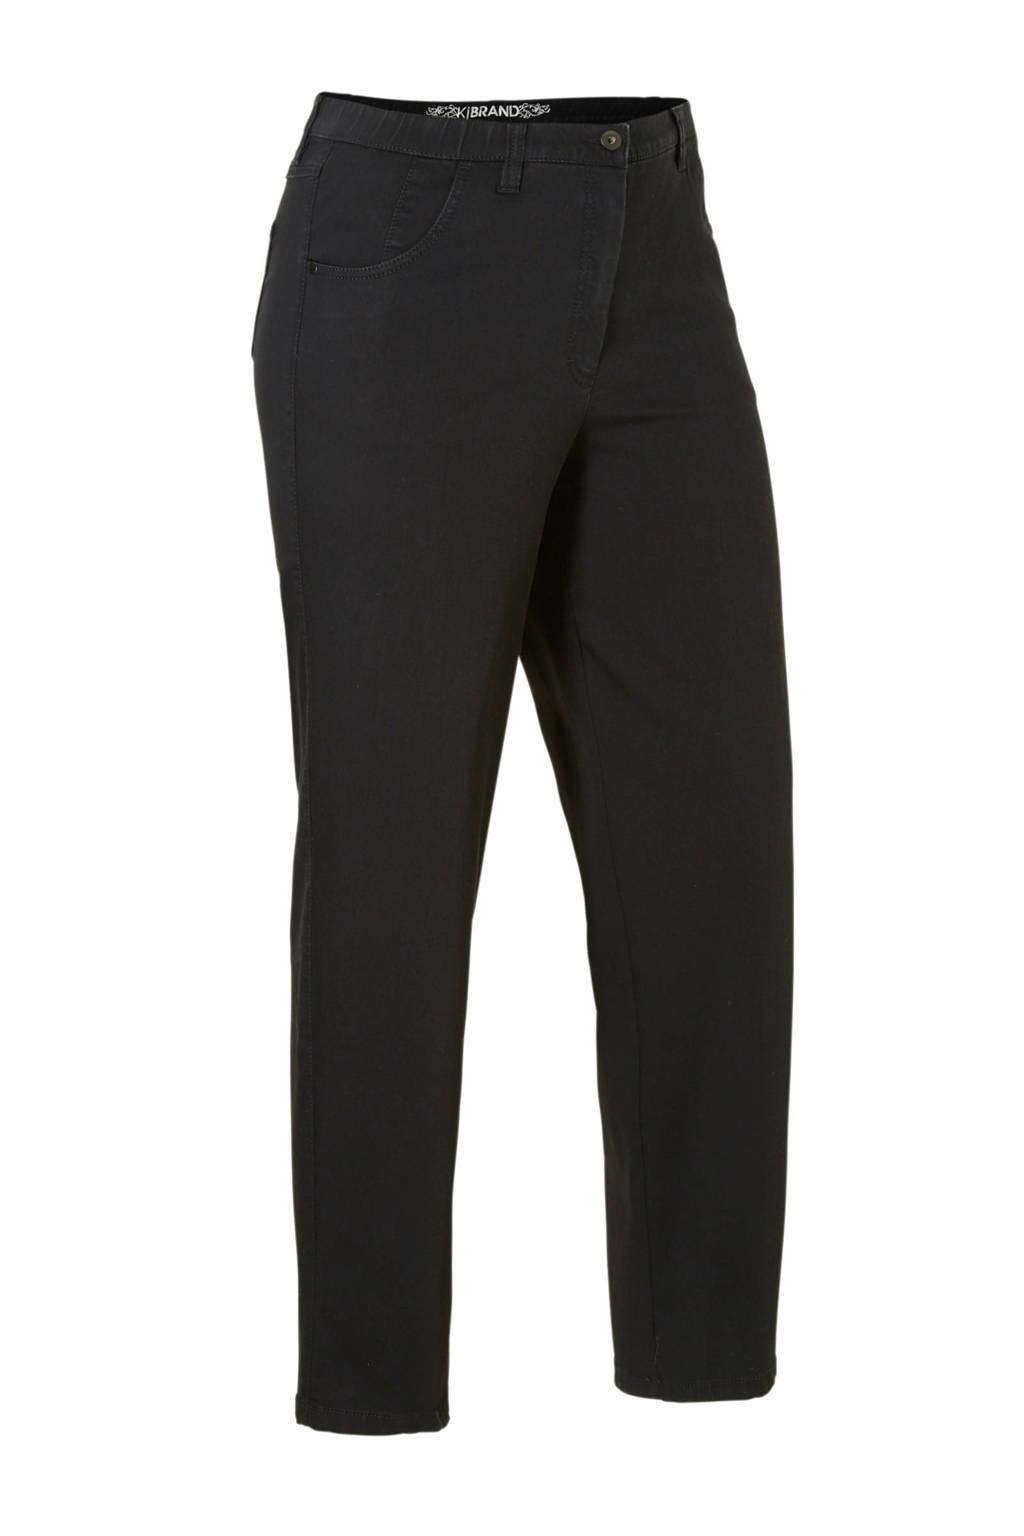 KjBRAND loose fit jeans Babsie met wol zwart, Zwart